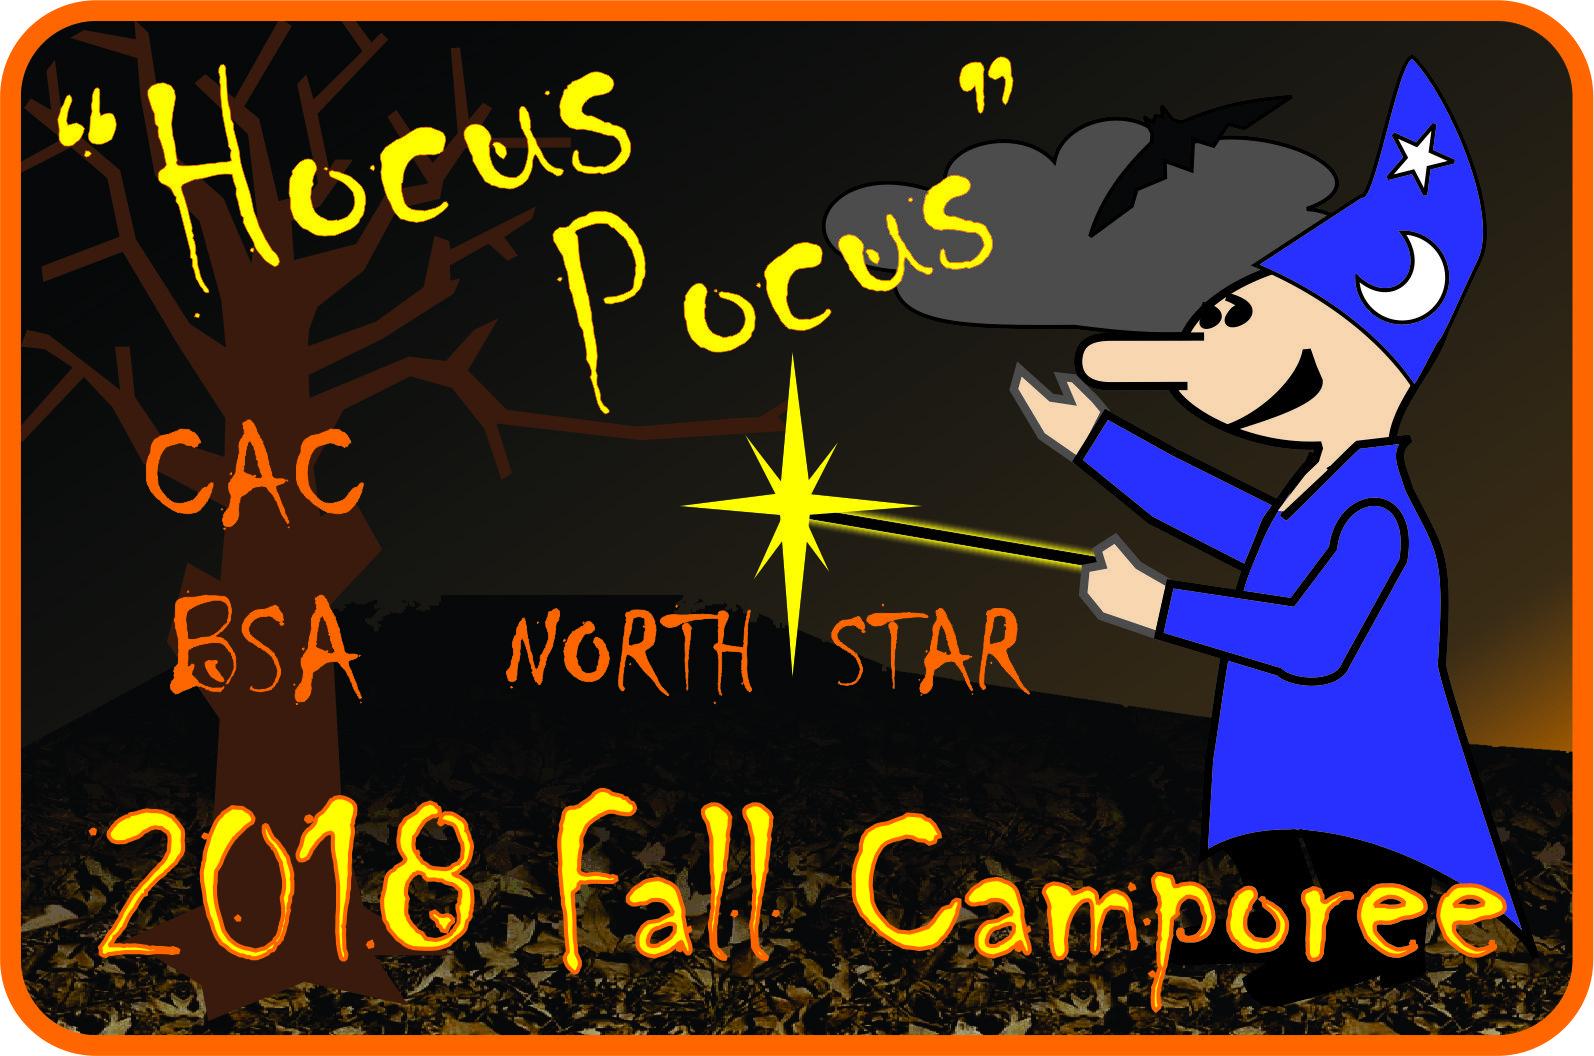 Fall Camporee 2018 Patch